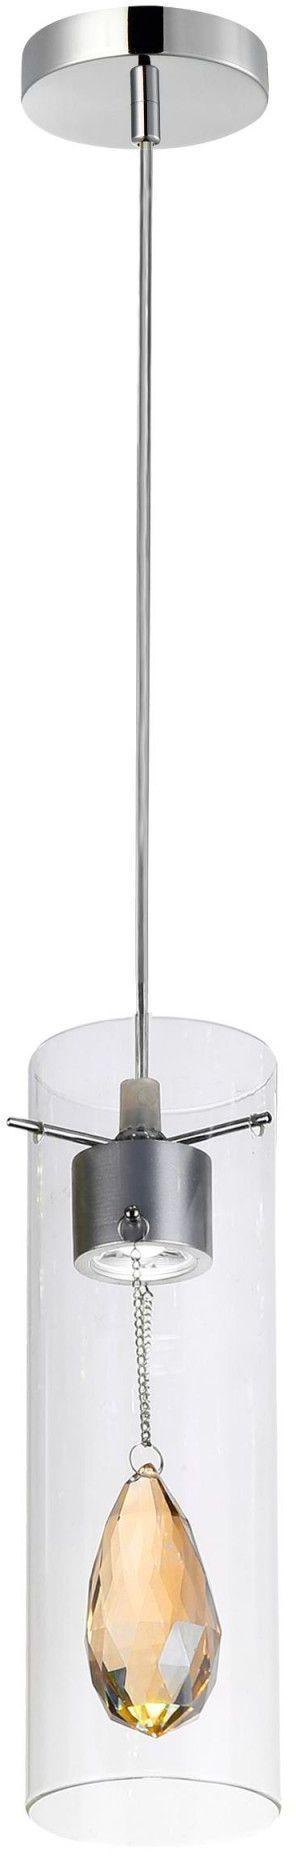 Ledowa lampa wisząca E375-Devi